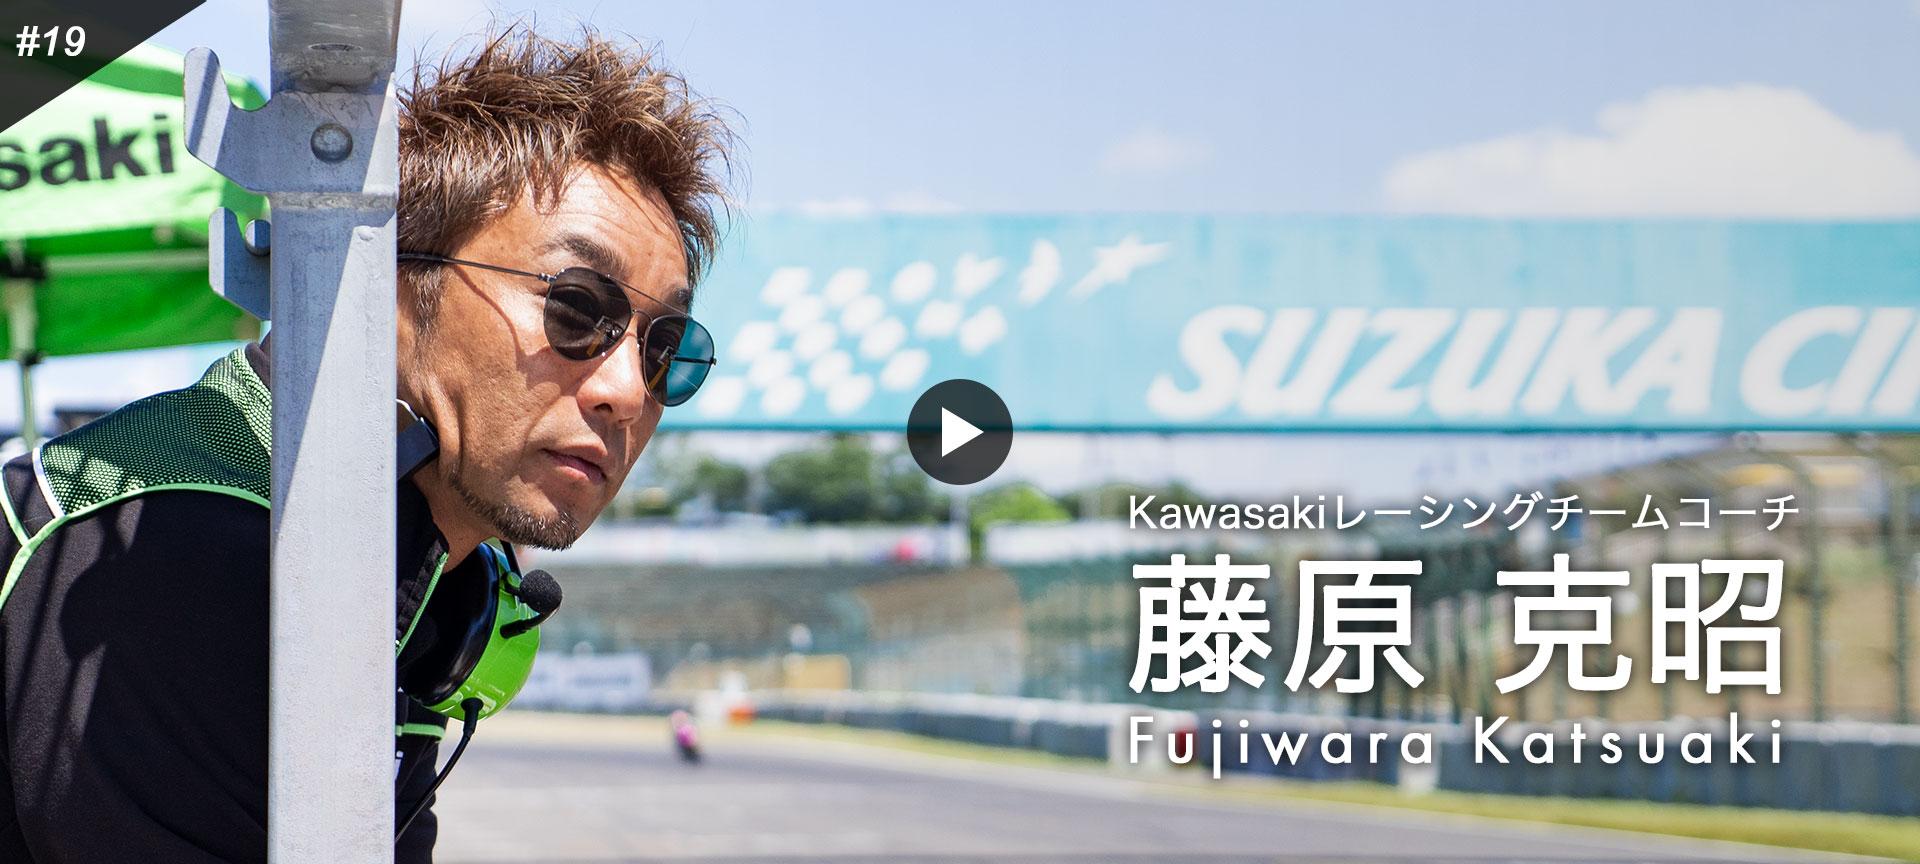 OWNDAYS Meets 藤原克昭(Fujiwara Katsuaki)